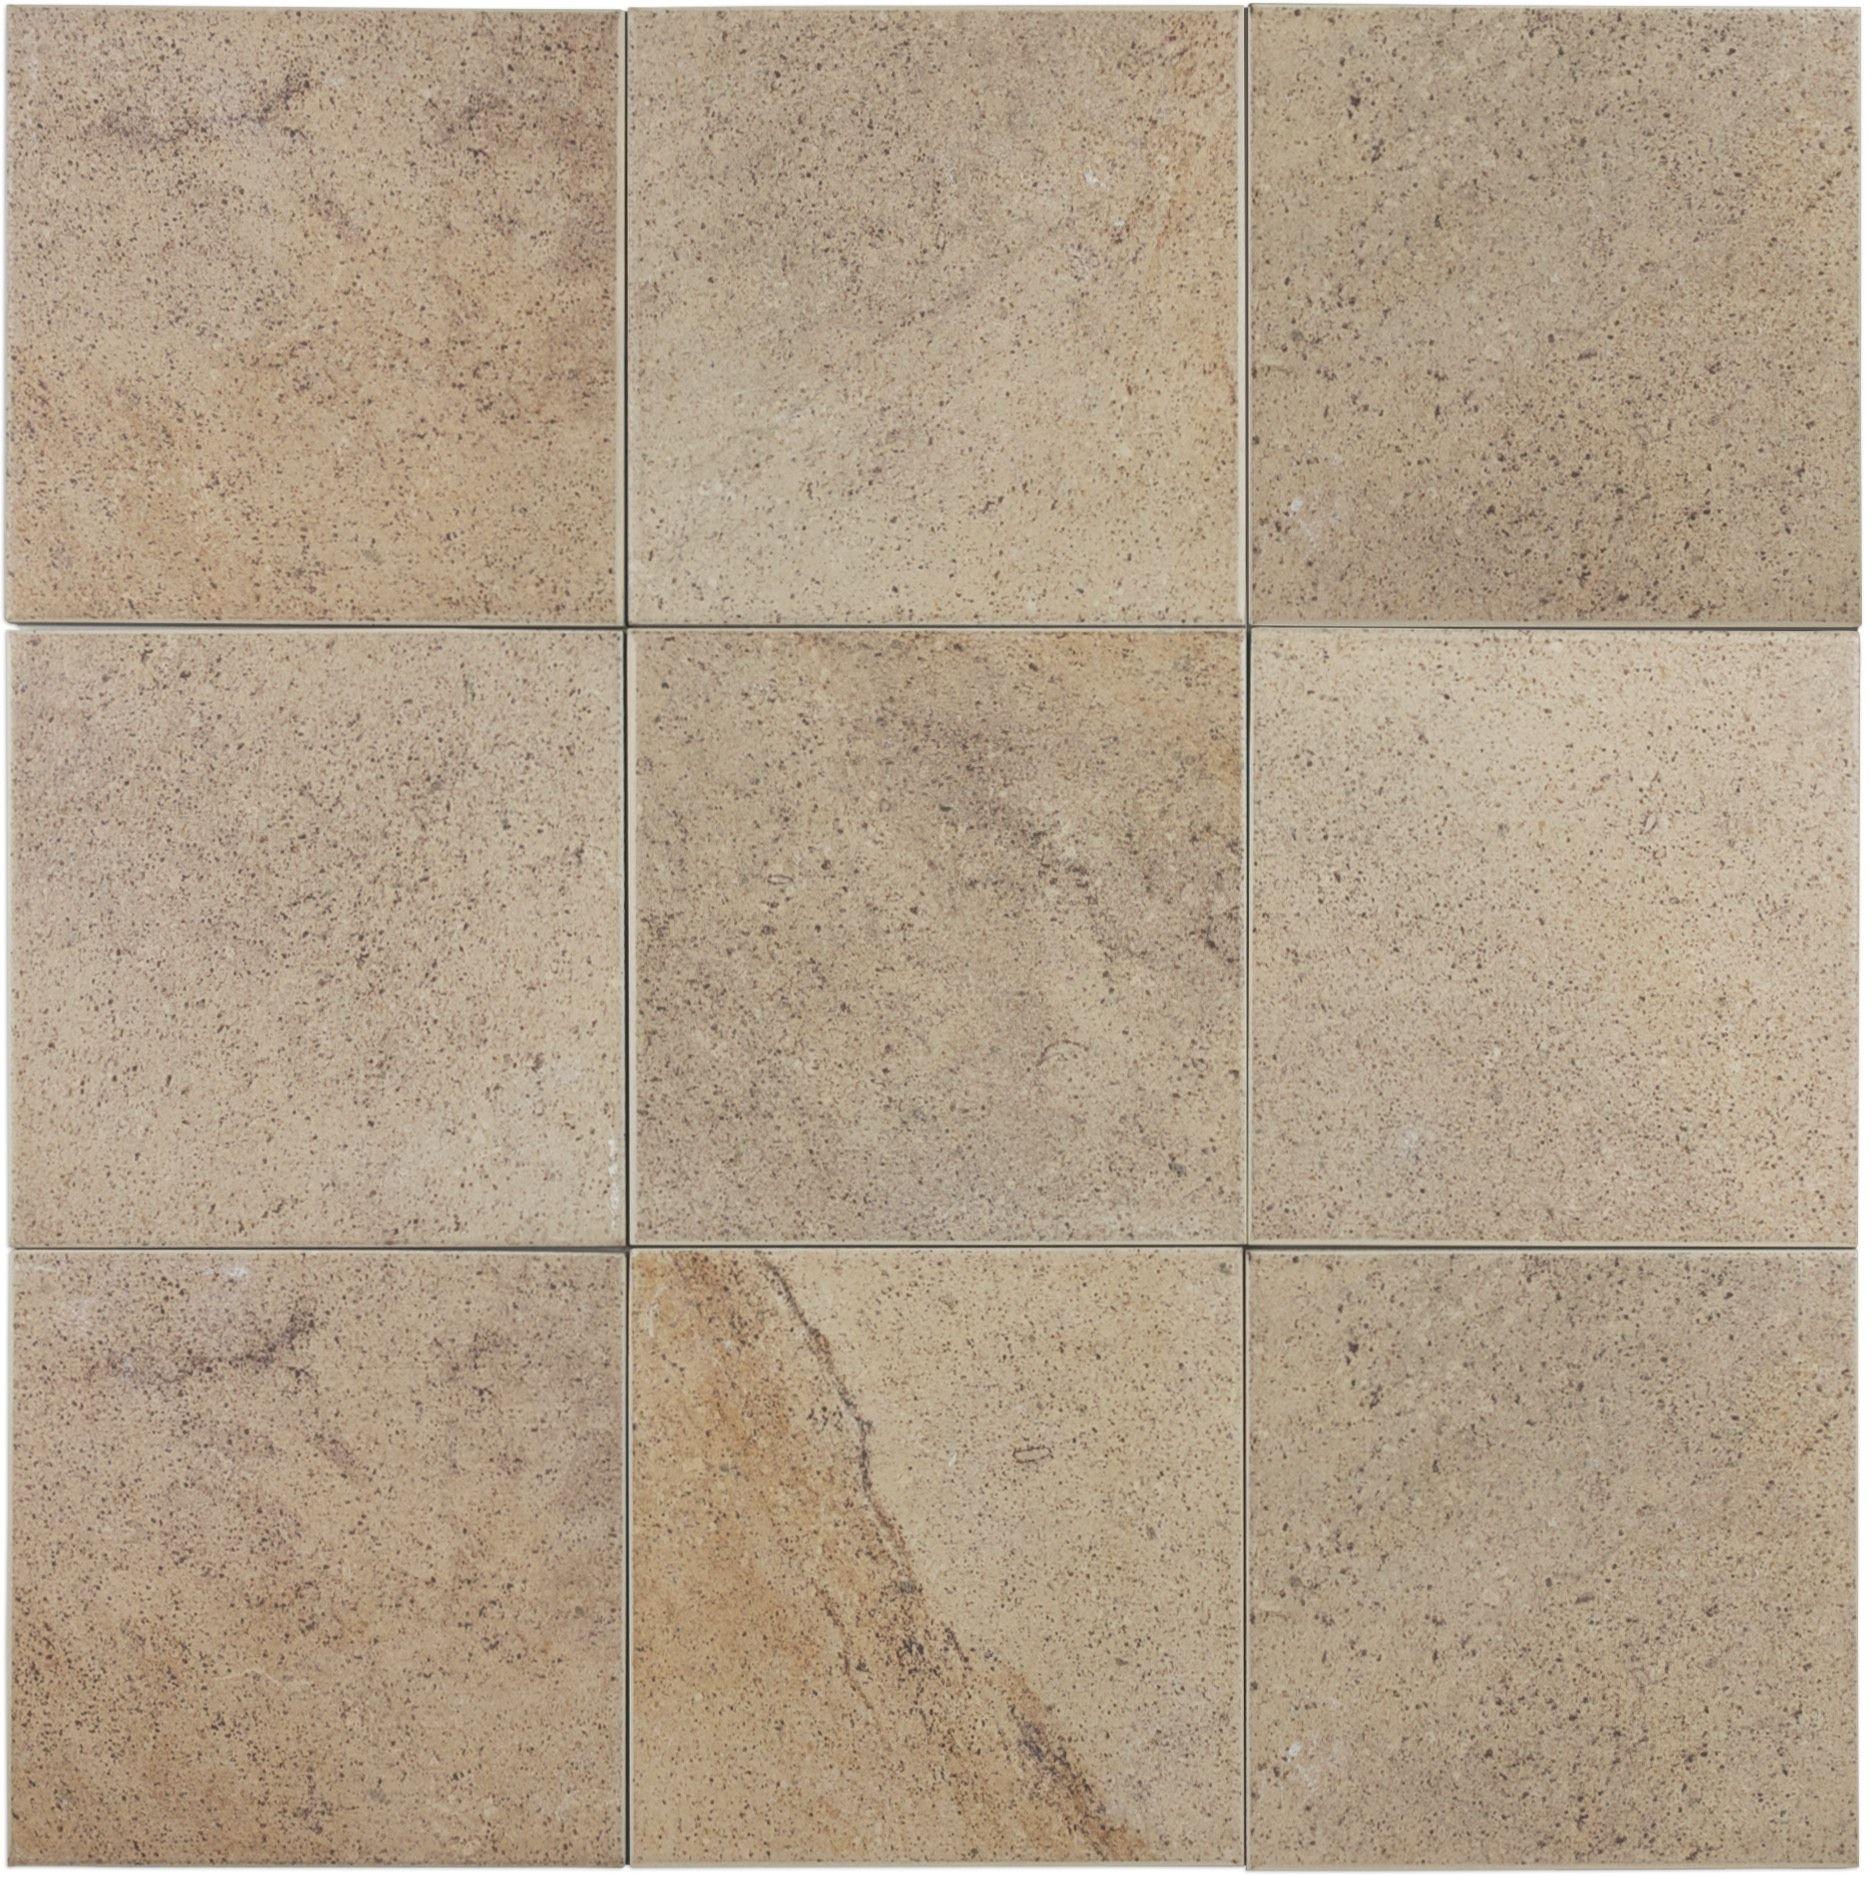 62 012 6 5 Quot X 6 5 Quot Arena Noce Porcelain Floor Tile Www